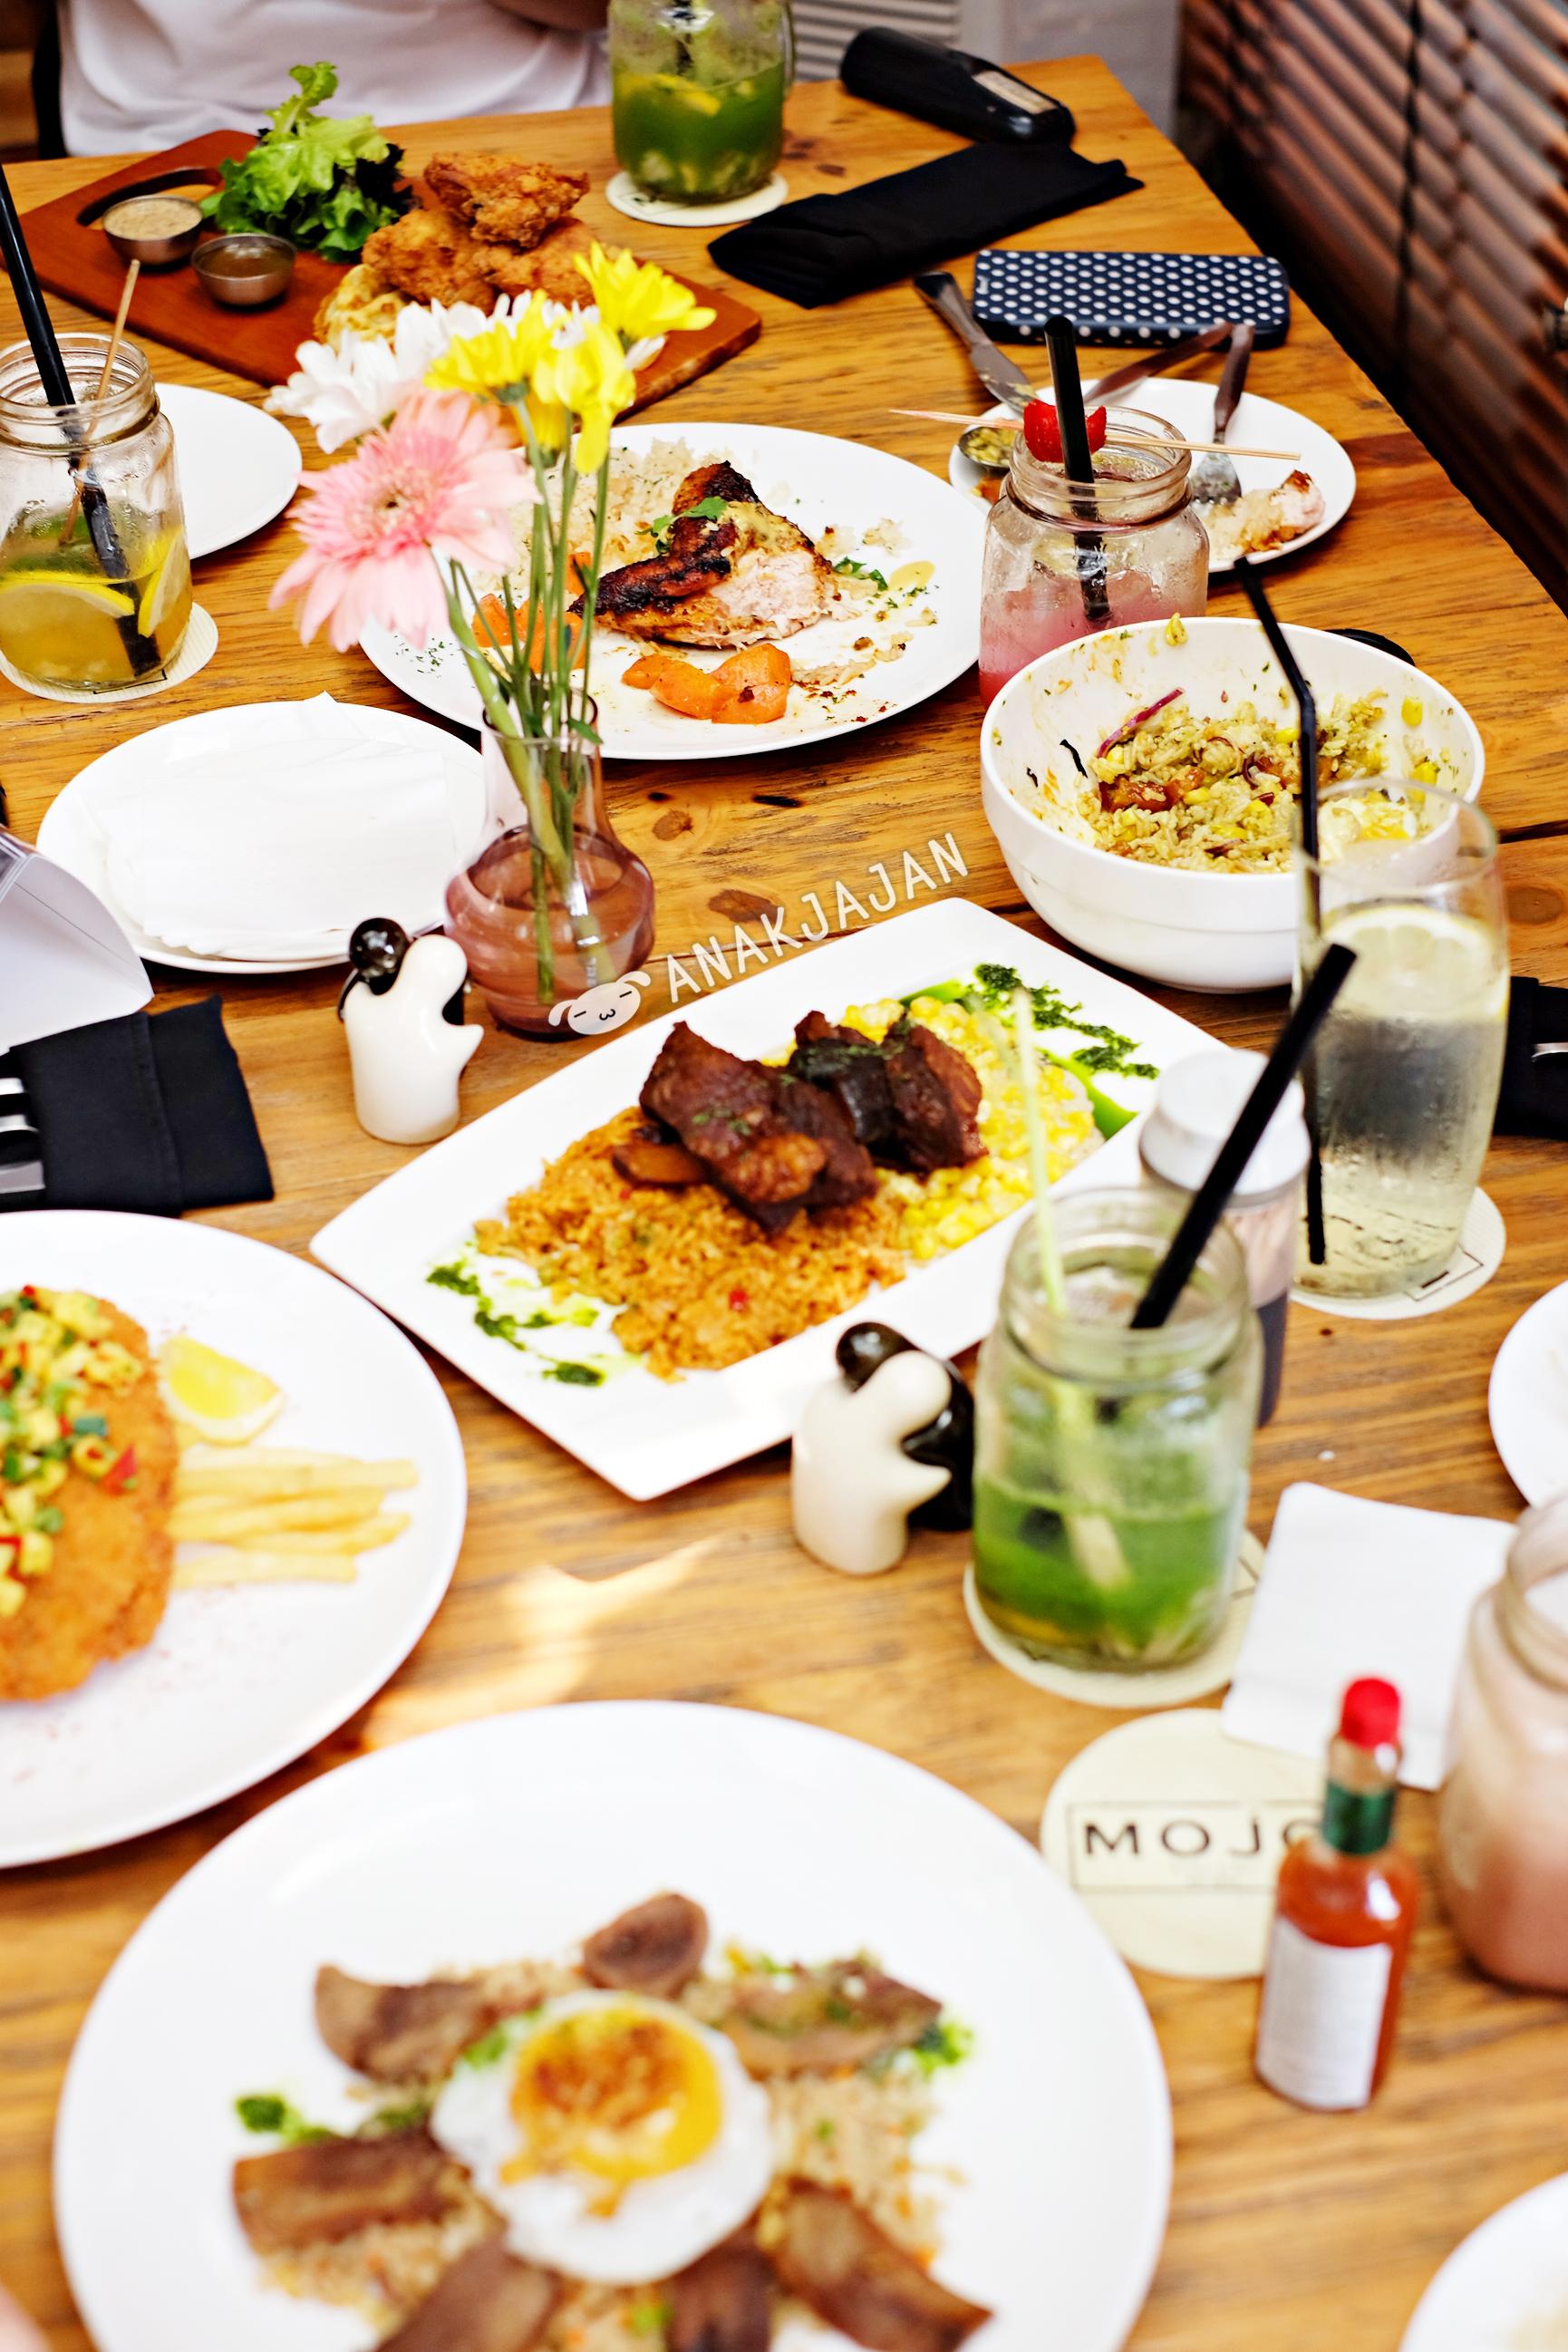 Mojo kitchen bar senopati jakarta anakjajan com for Mojo restaurant